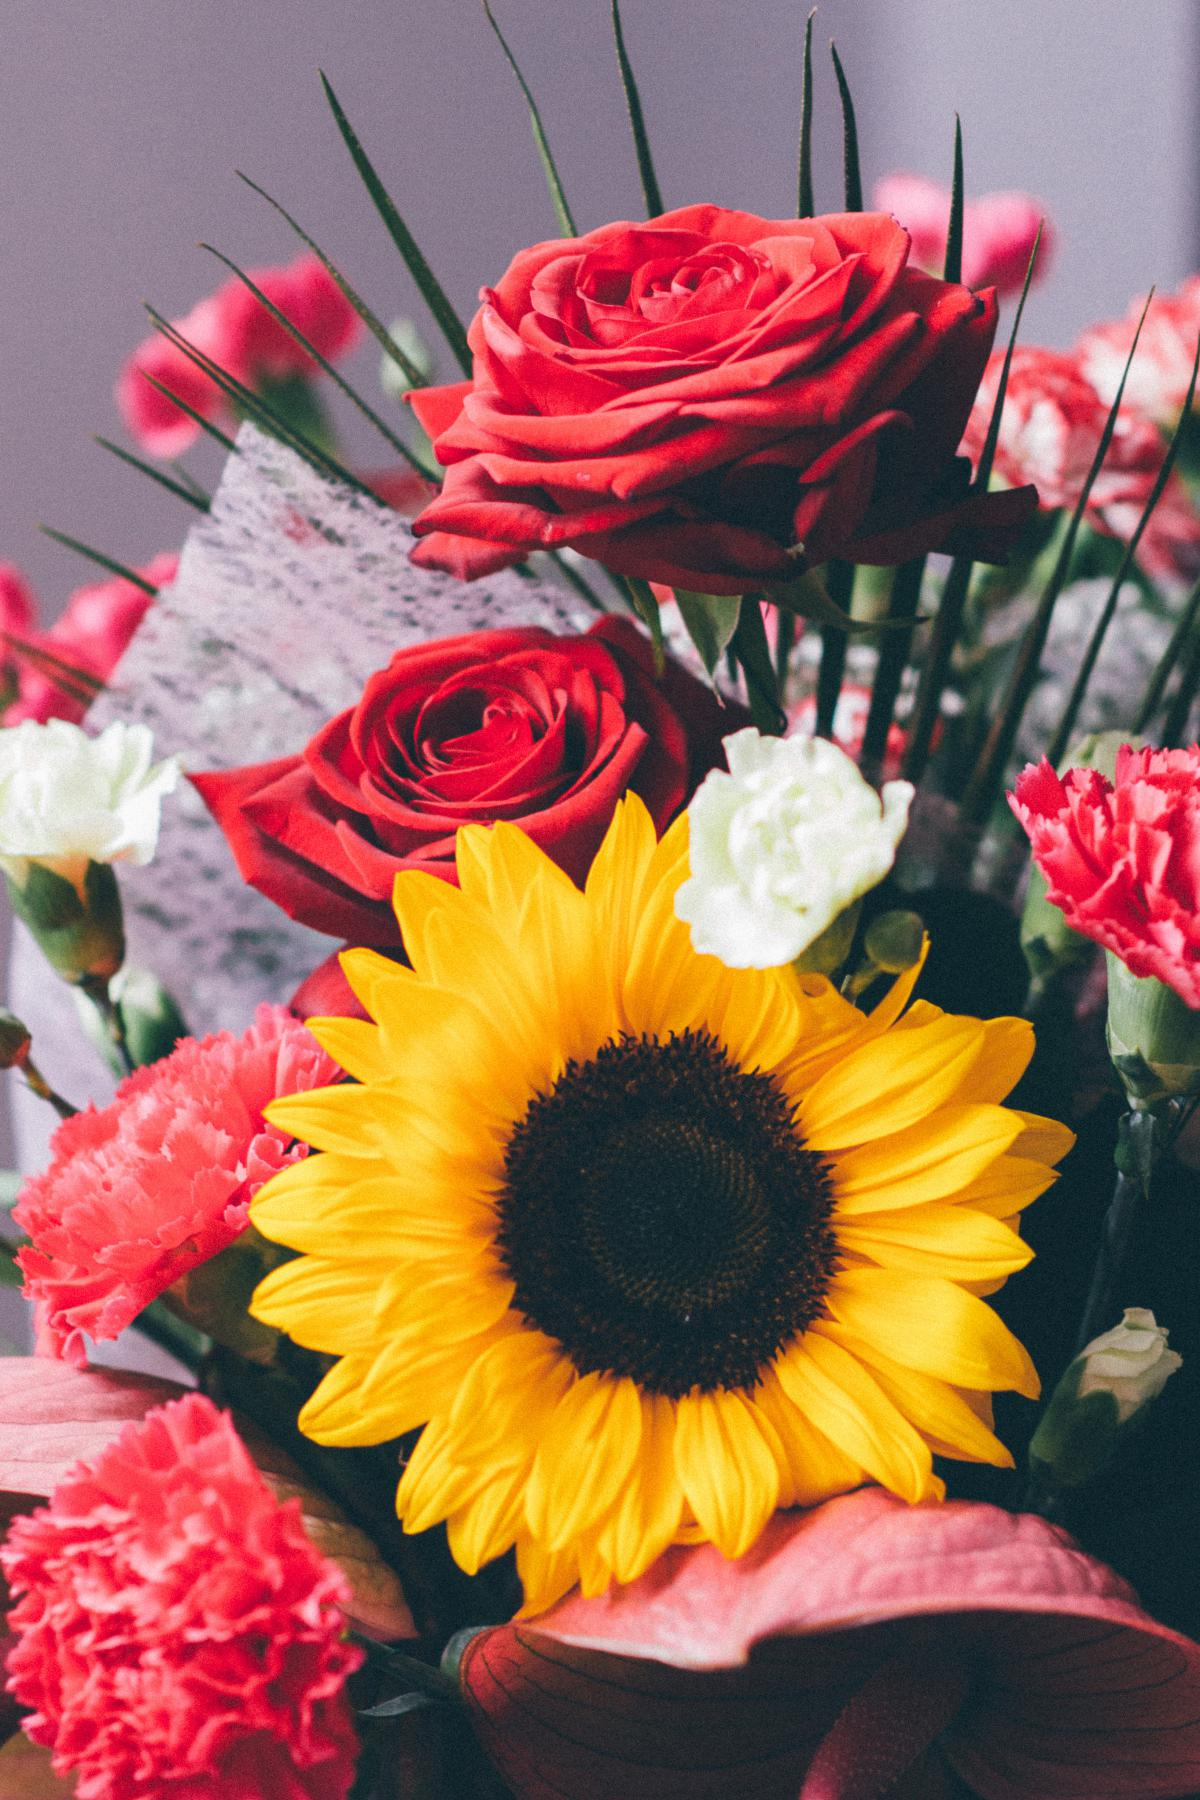 Bouquet flowers roses  #21336